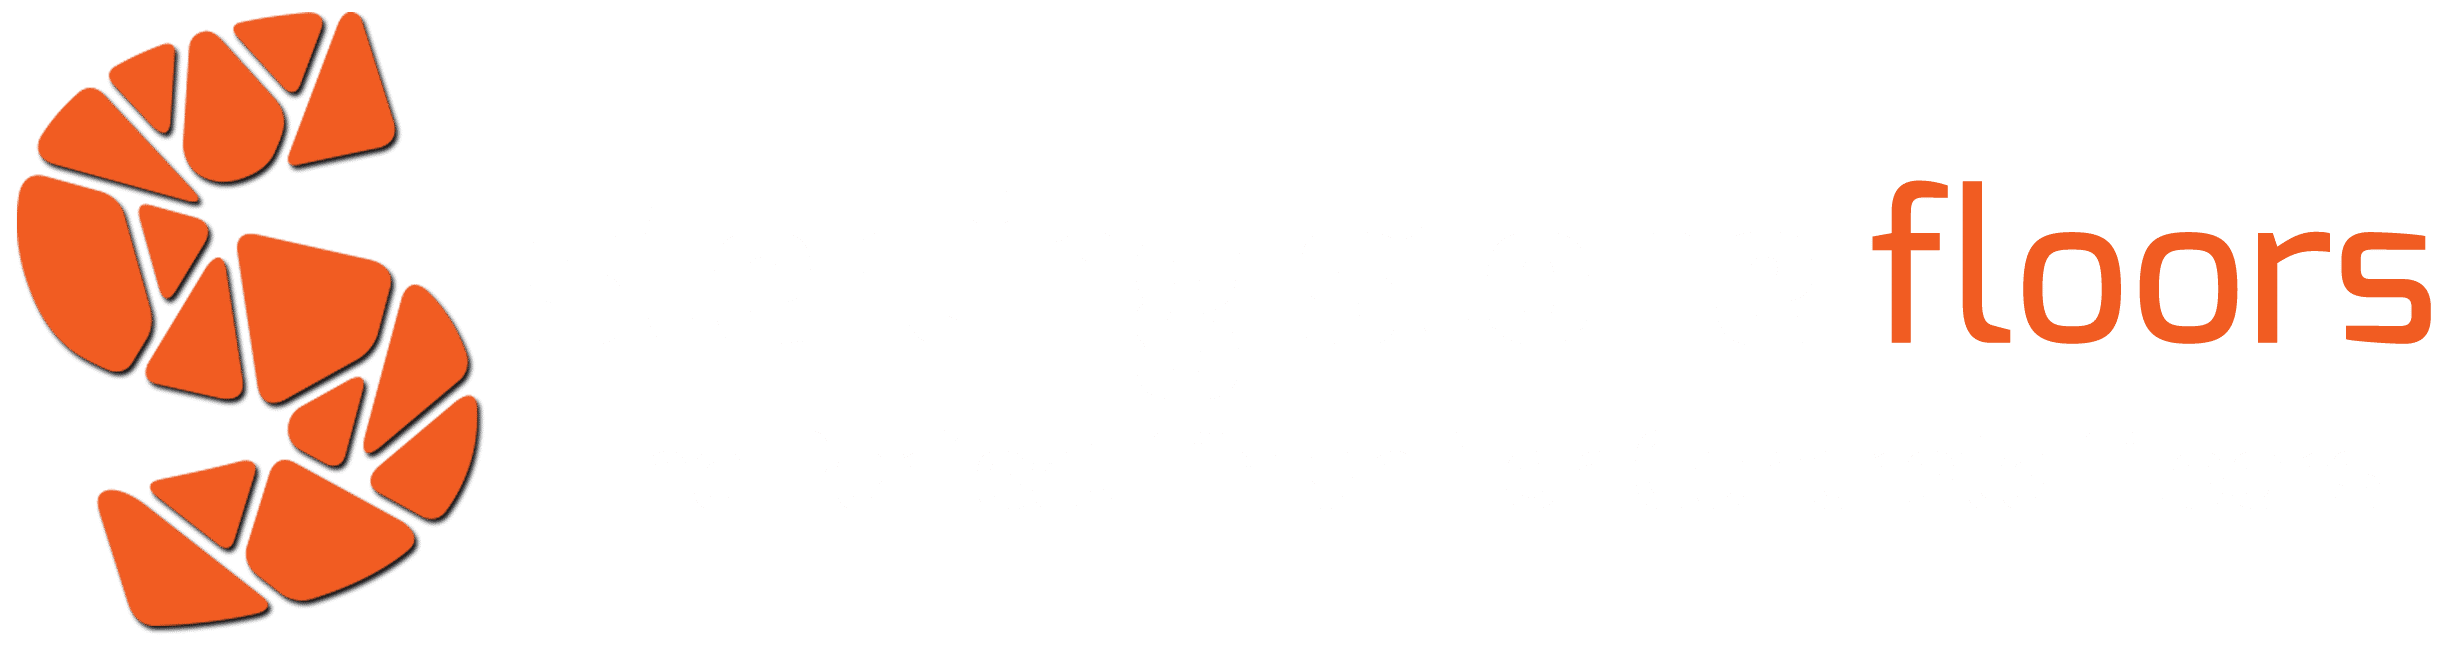 Sterling Stone Floors